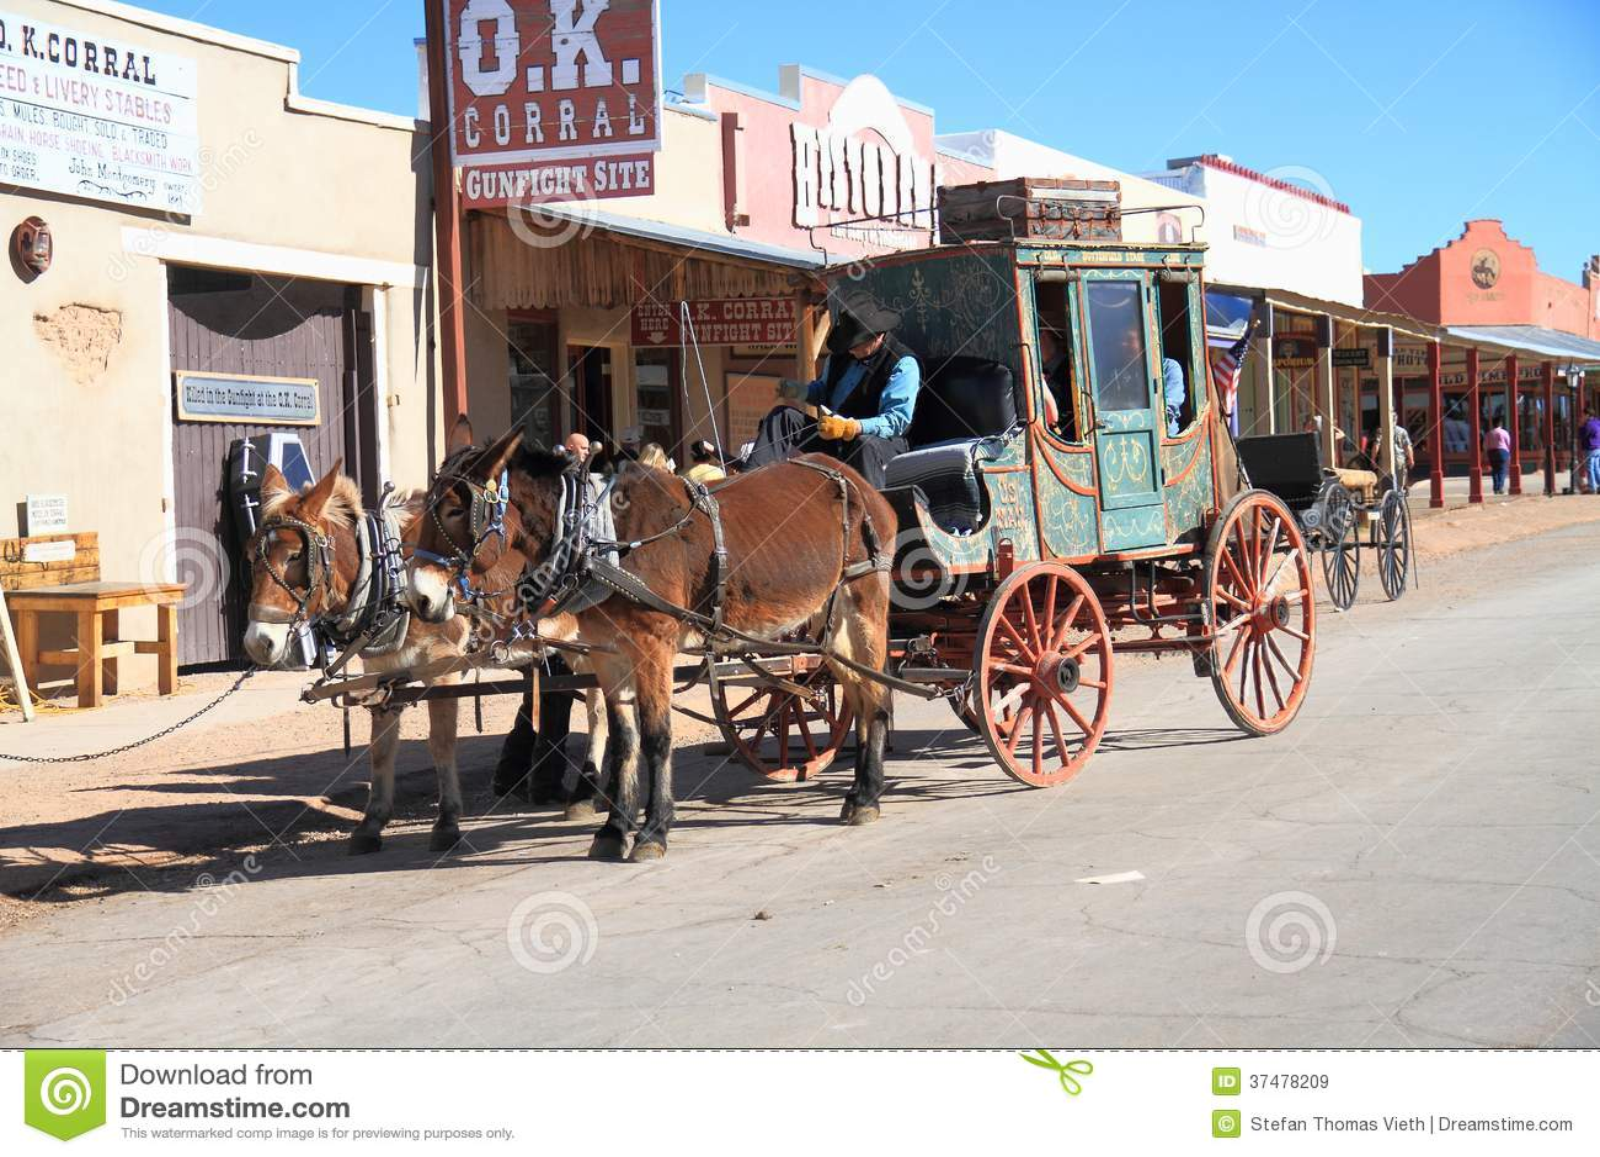 USA, Arizona/Tombstone: Old West - Stagecoach